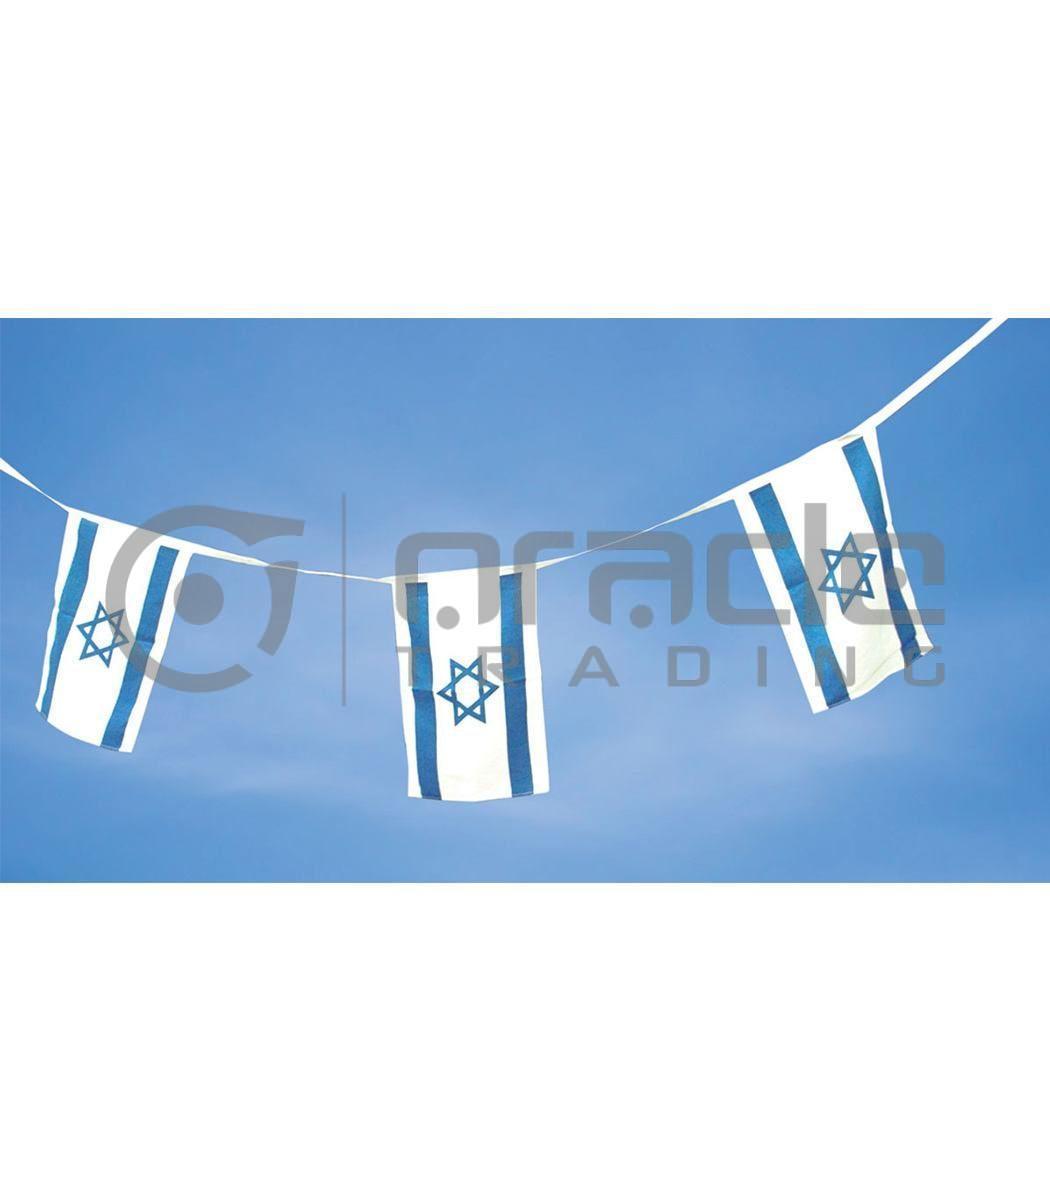 Israel String Flag